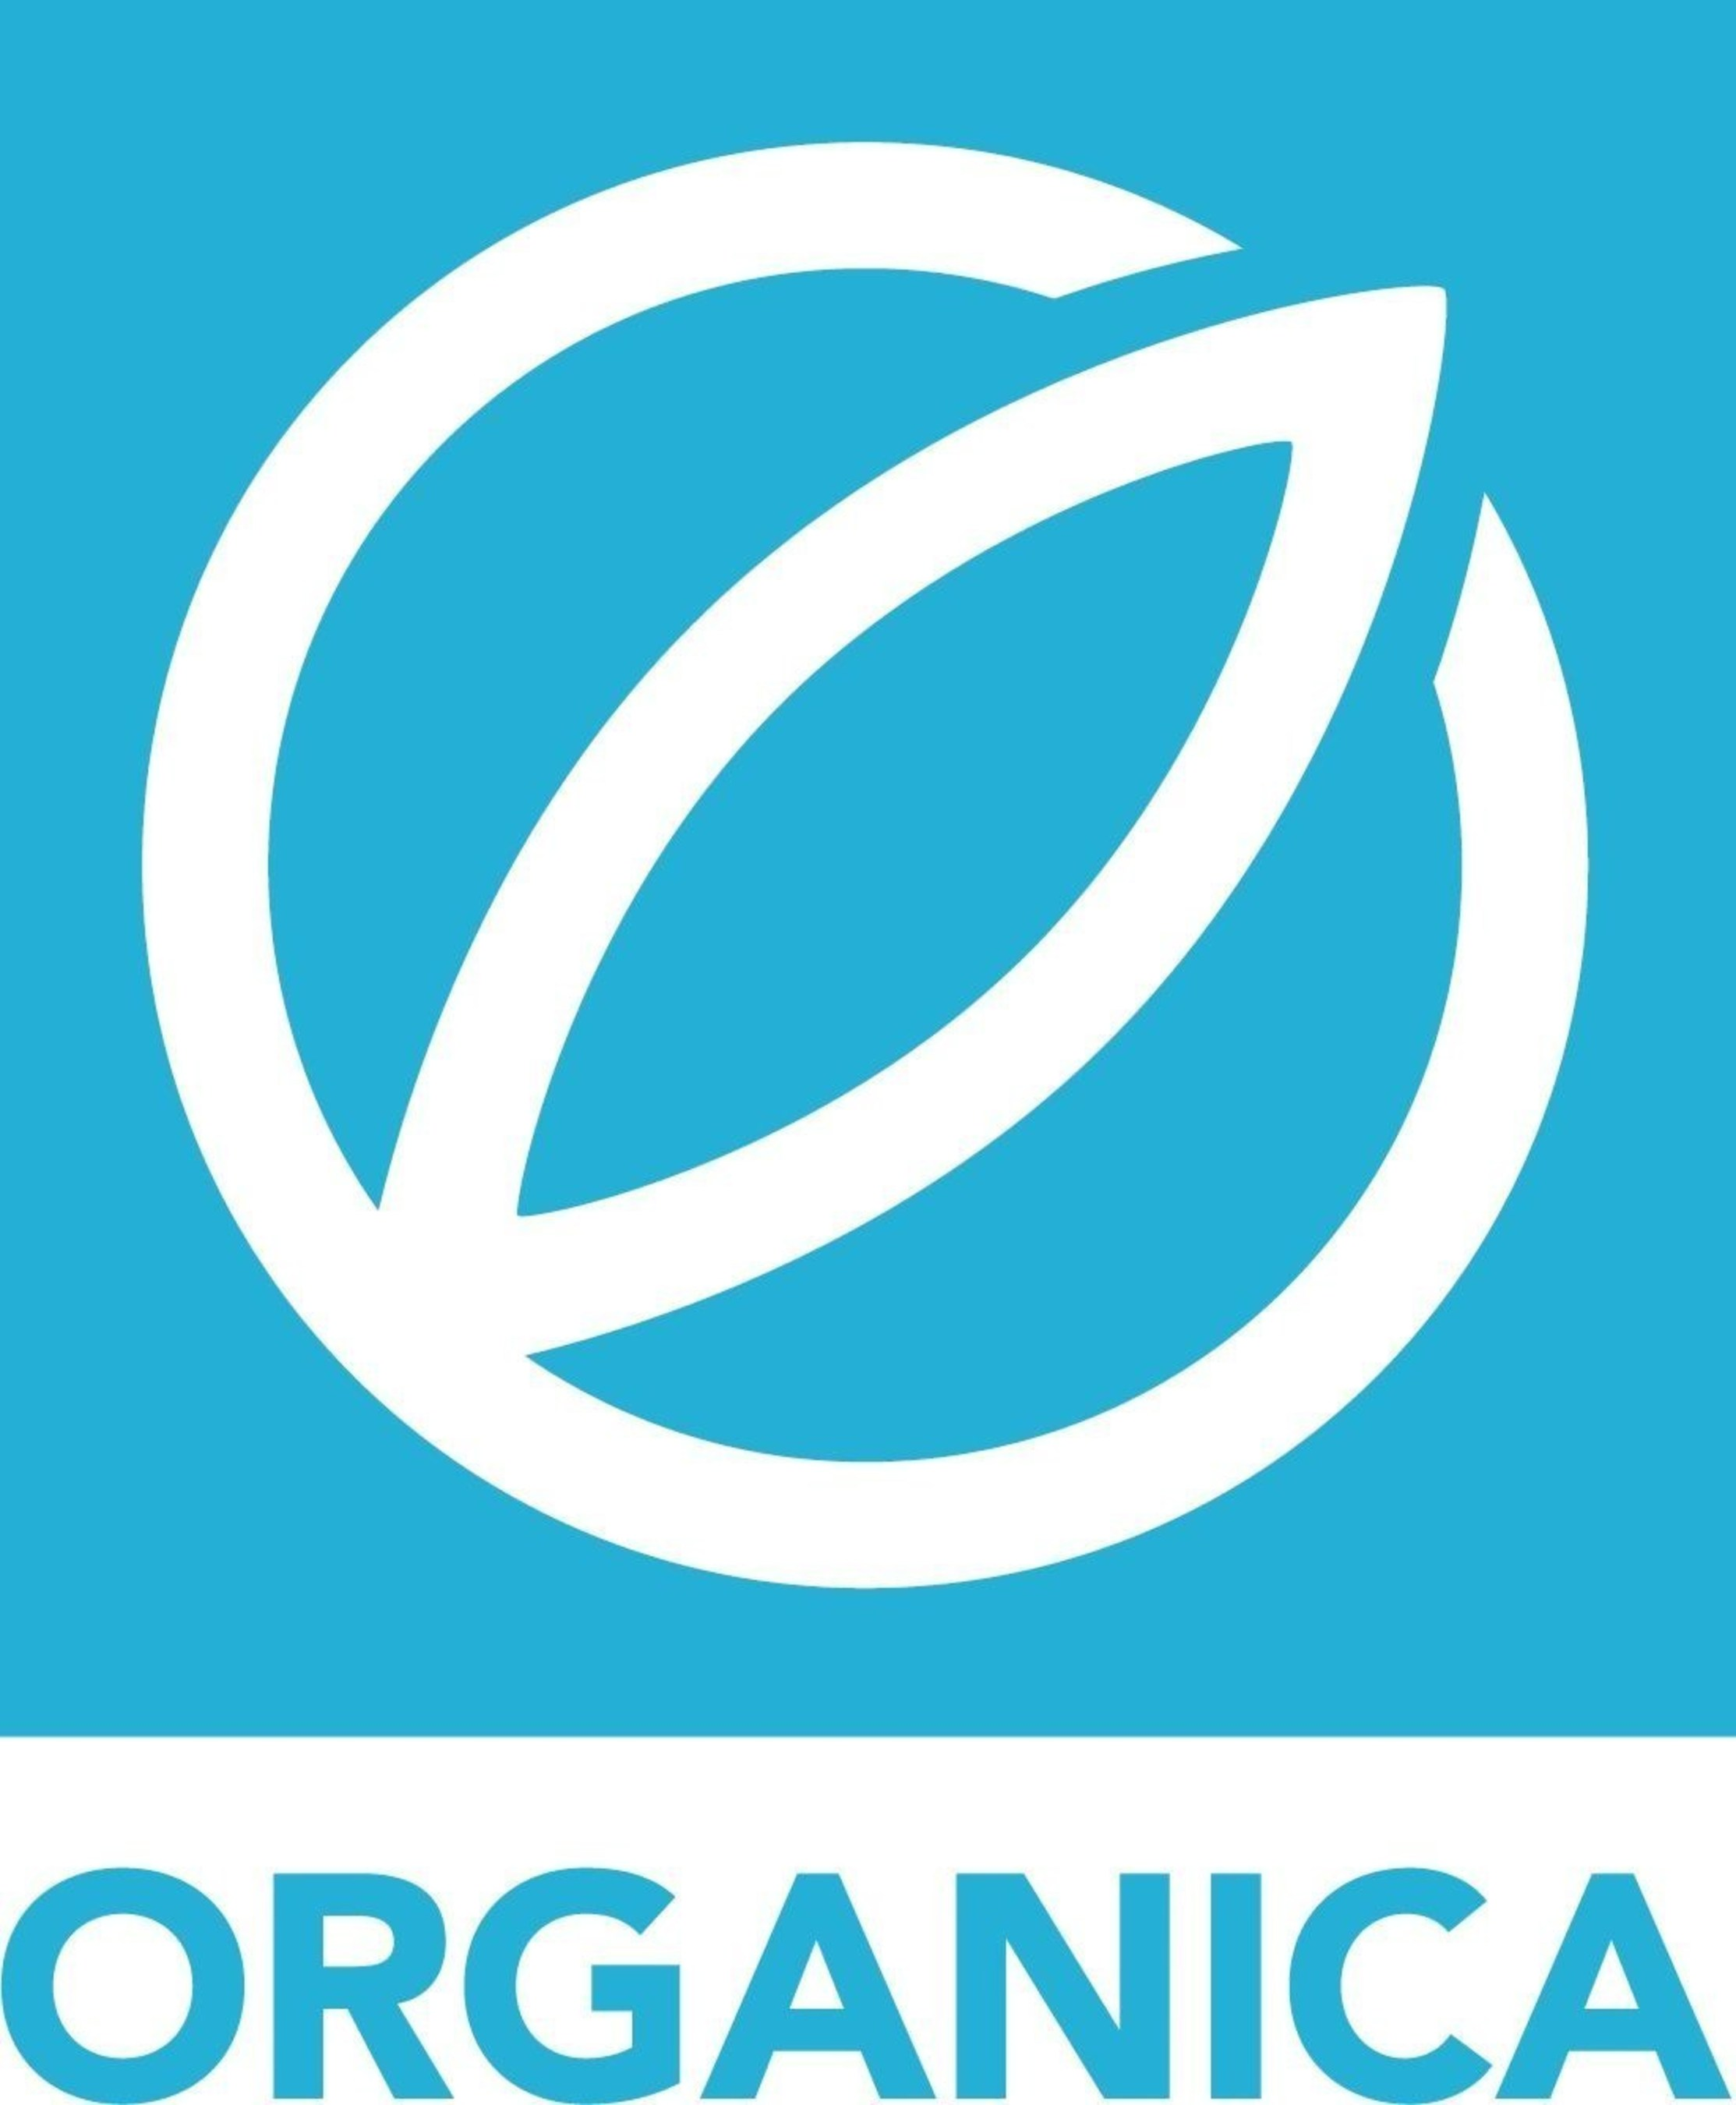 Organica Water, Inc (PRNewsFoto/Organica Water, Inc) (PRNewsFoto/Organica Water, Inc)